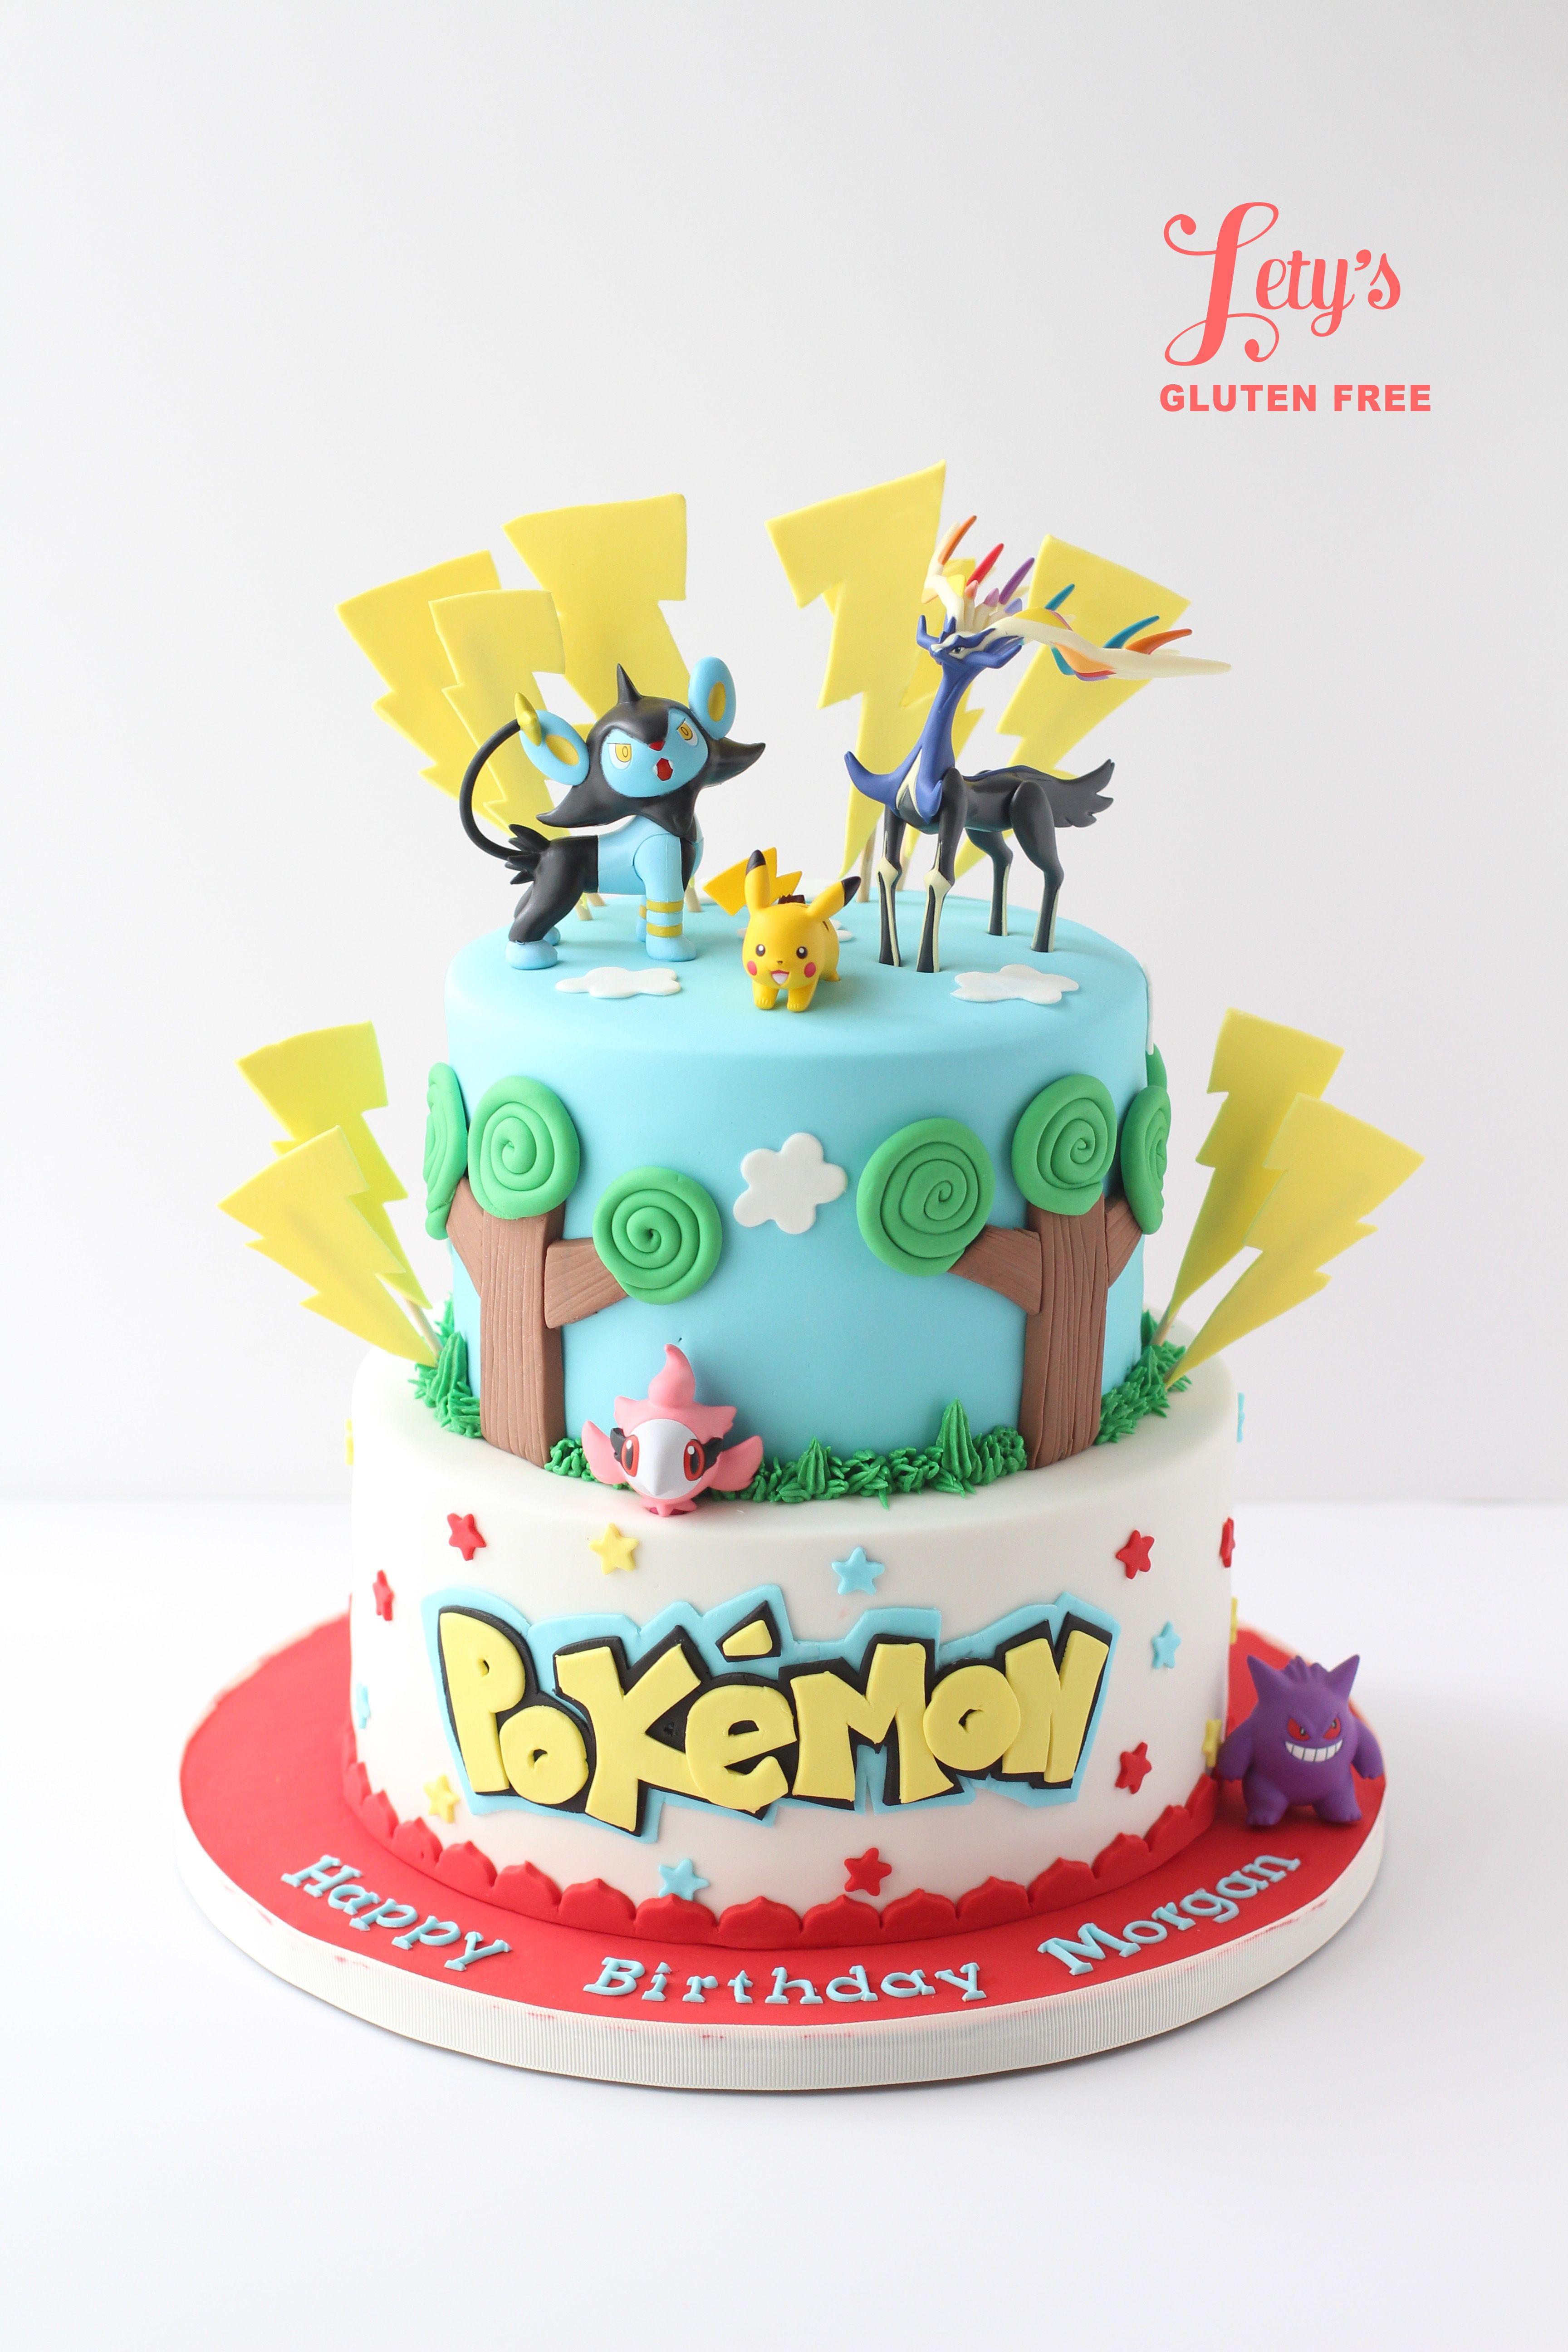 Two Tier Pokemon Theme Birthday Cake With Figures Original Design By Three Sweeties Made Letys Gluten Free Houston TX